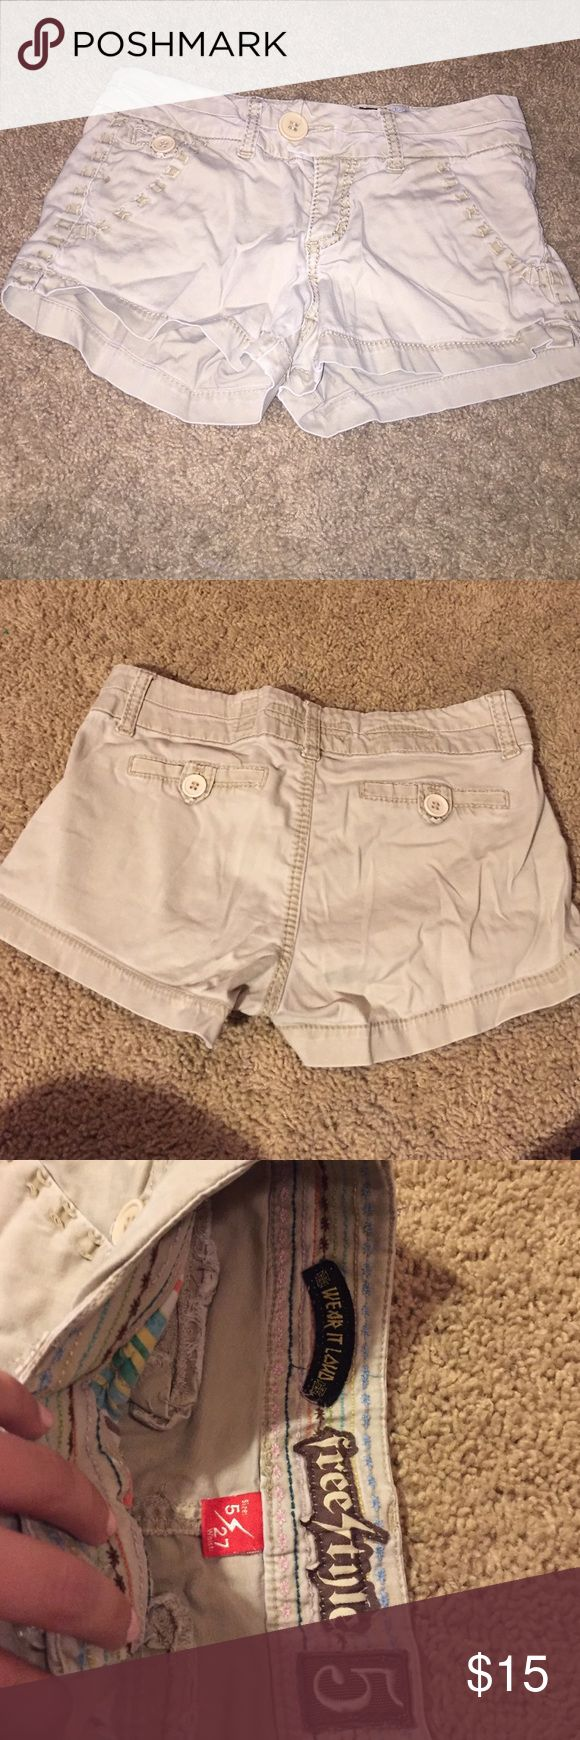 Beige shorts Beige shorts! Super cozy. No back pockets Shorts